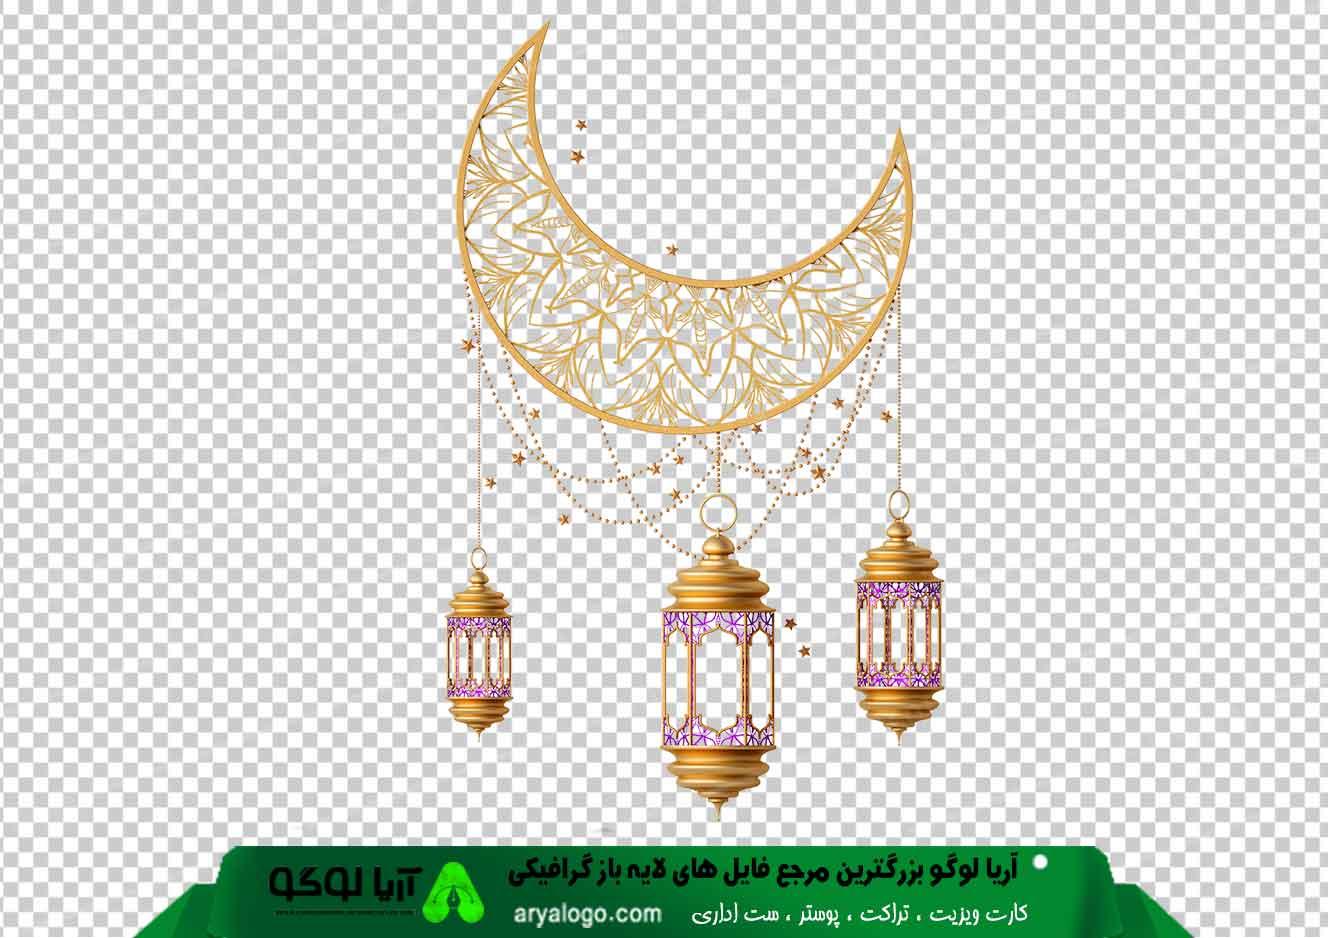 وکتور png ماه رمضان 15